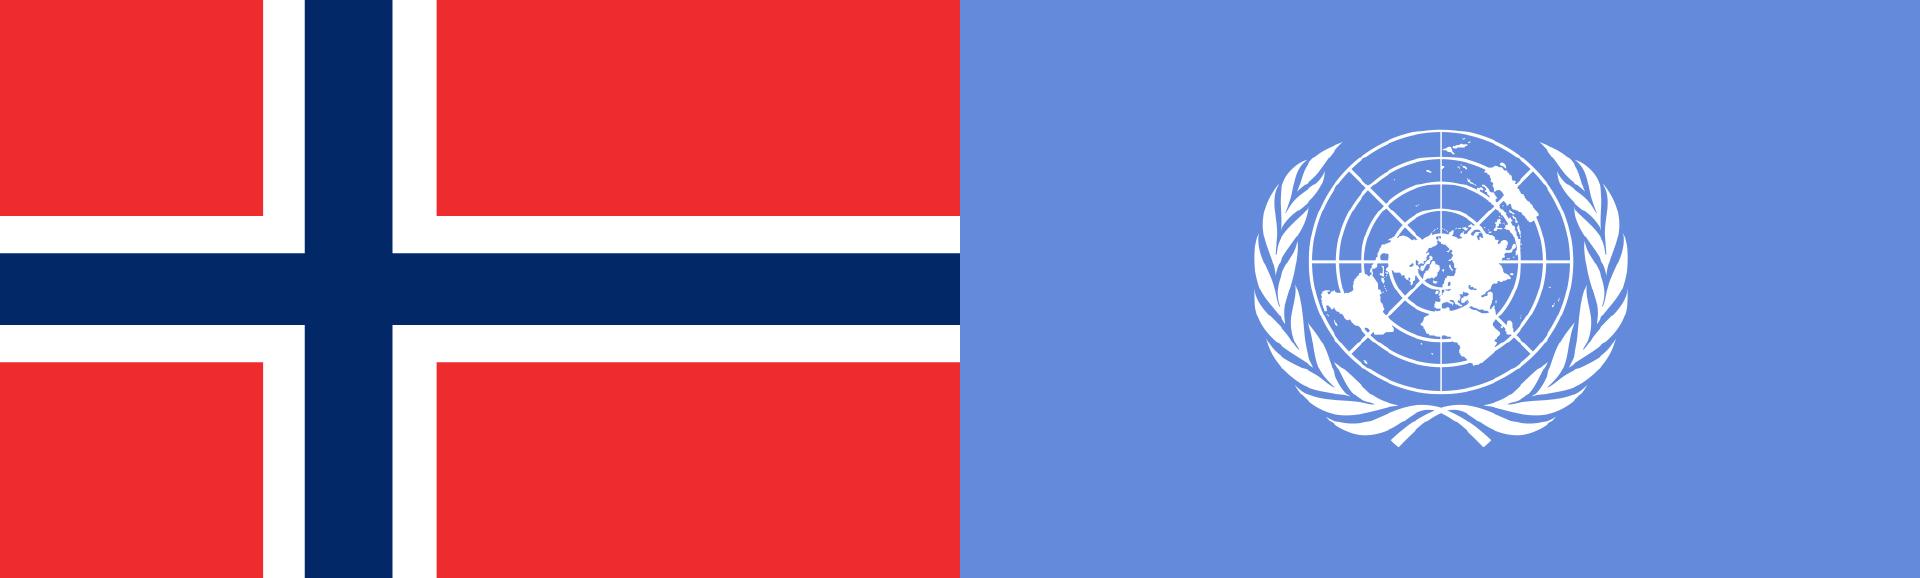 fn flagget